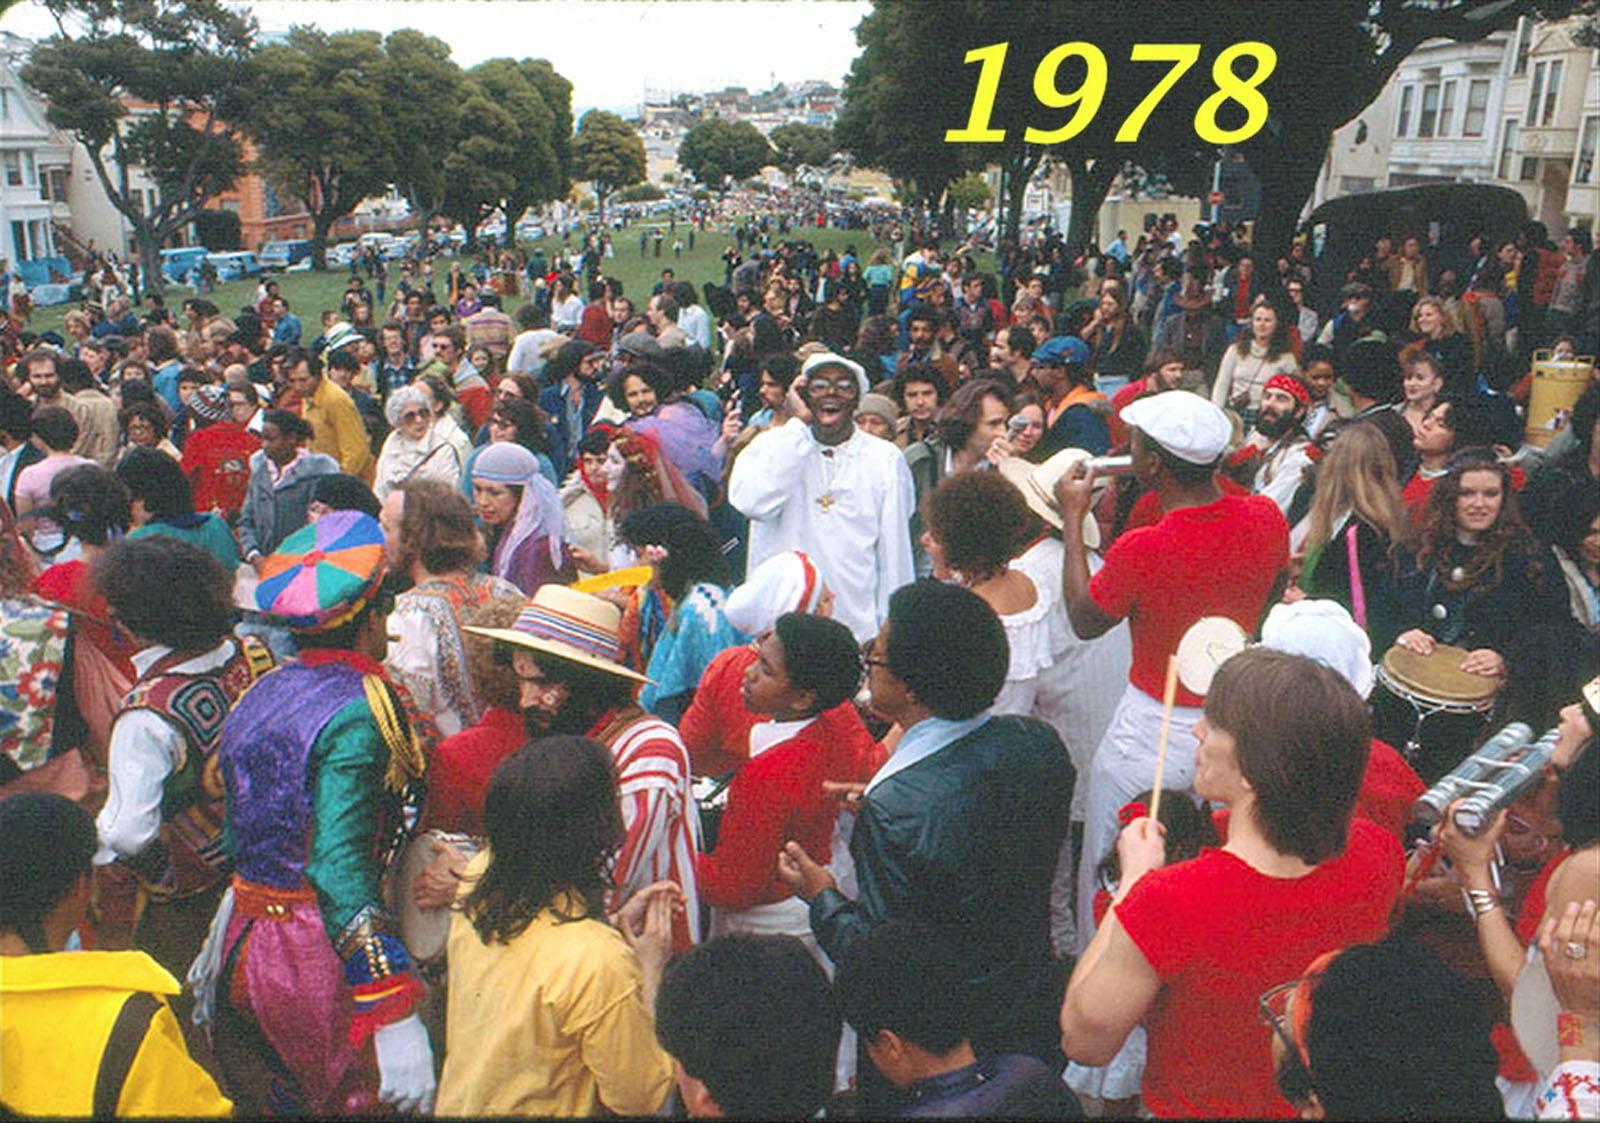 Carnaval Started on Precita Park in 1978